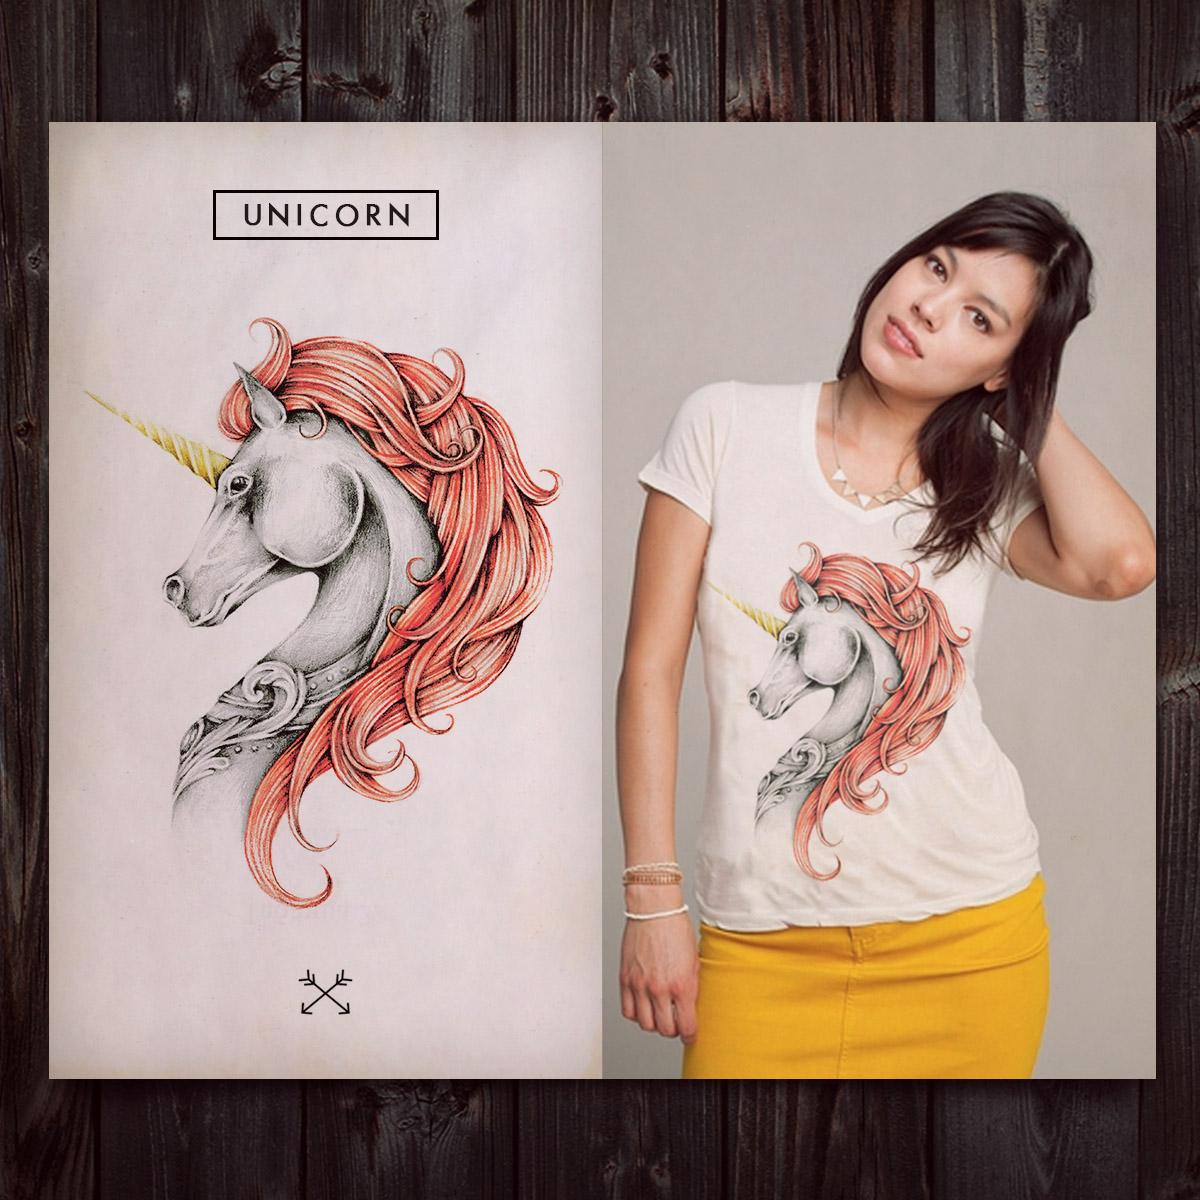 Unicorn by INDZ on Threadless